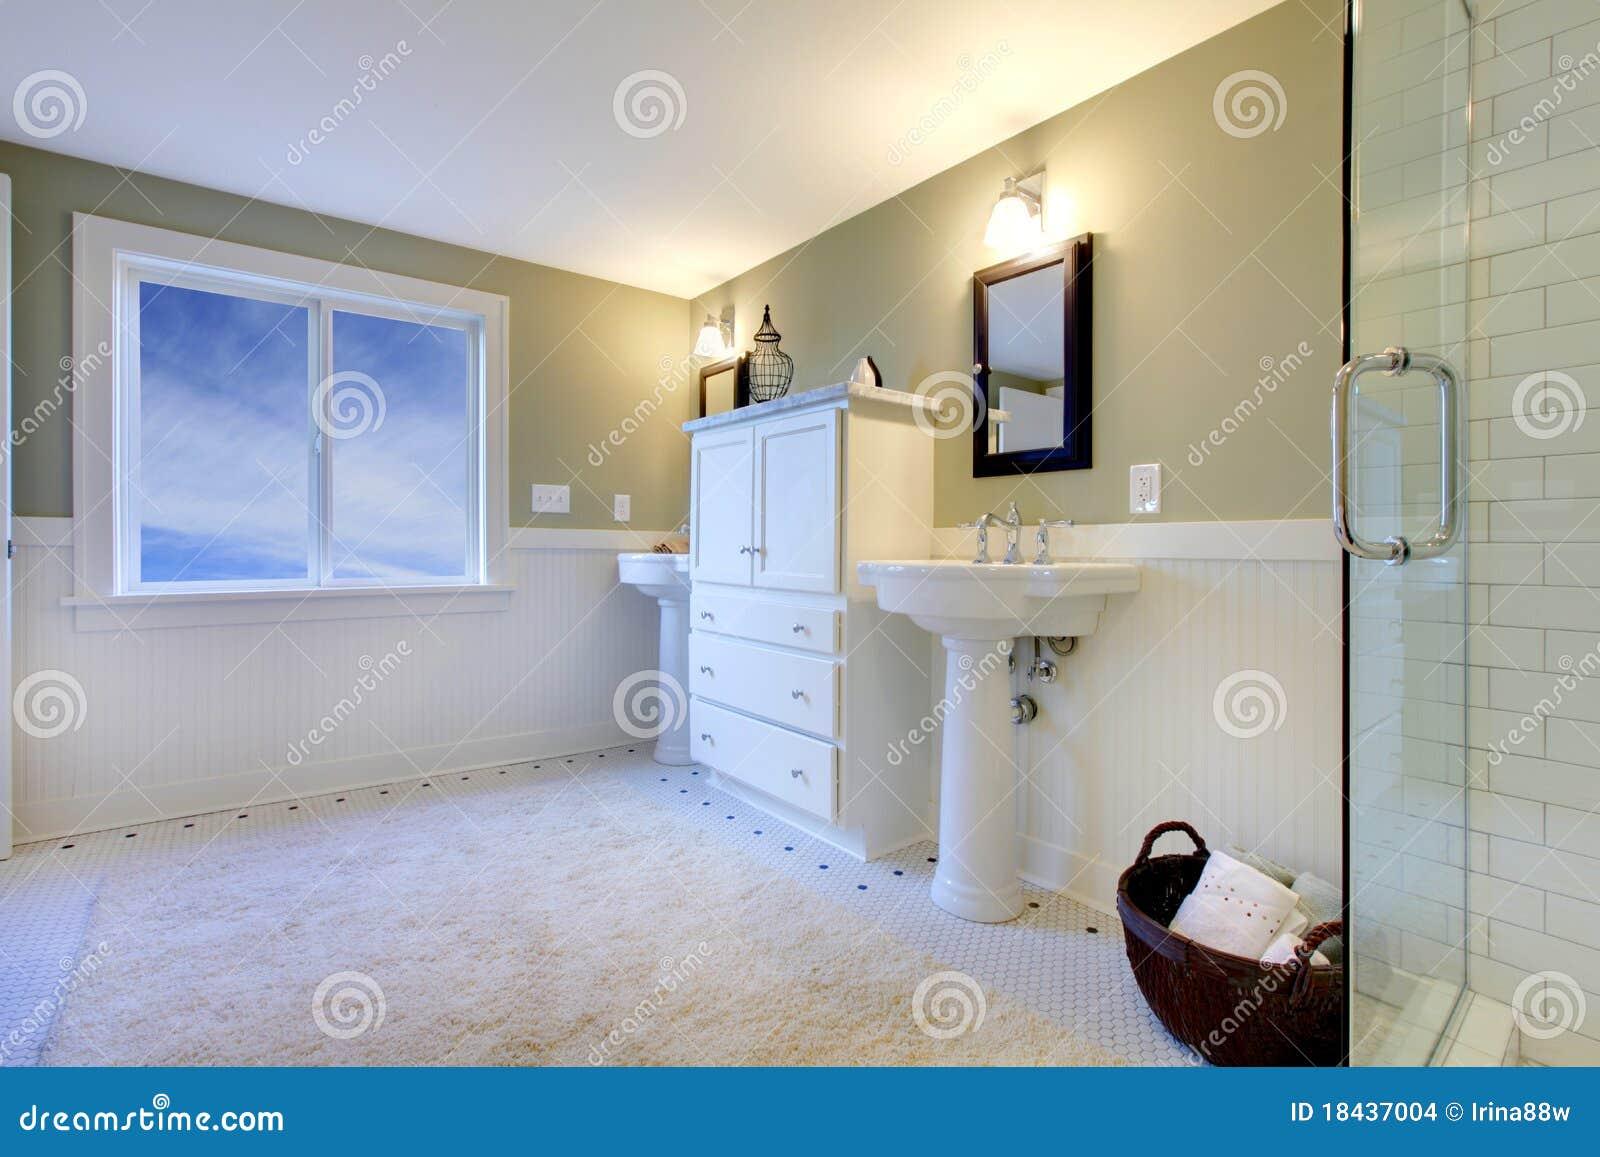 Banheiro Moderno Verde E Branco Fresco Luxuoso Imagens de Stock  Imagem 184 -> Banheiro Moderno Verde